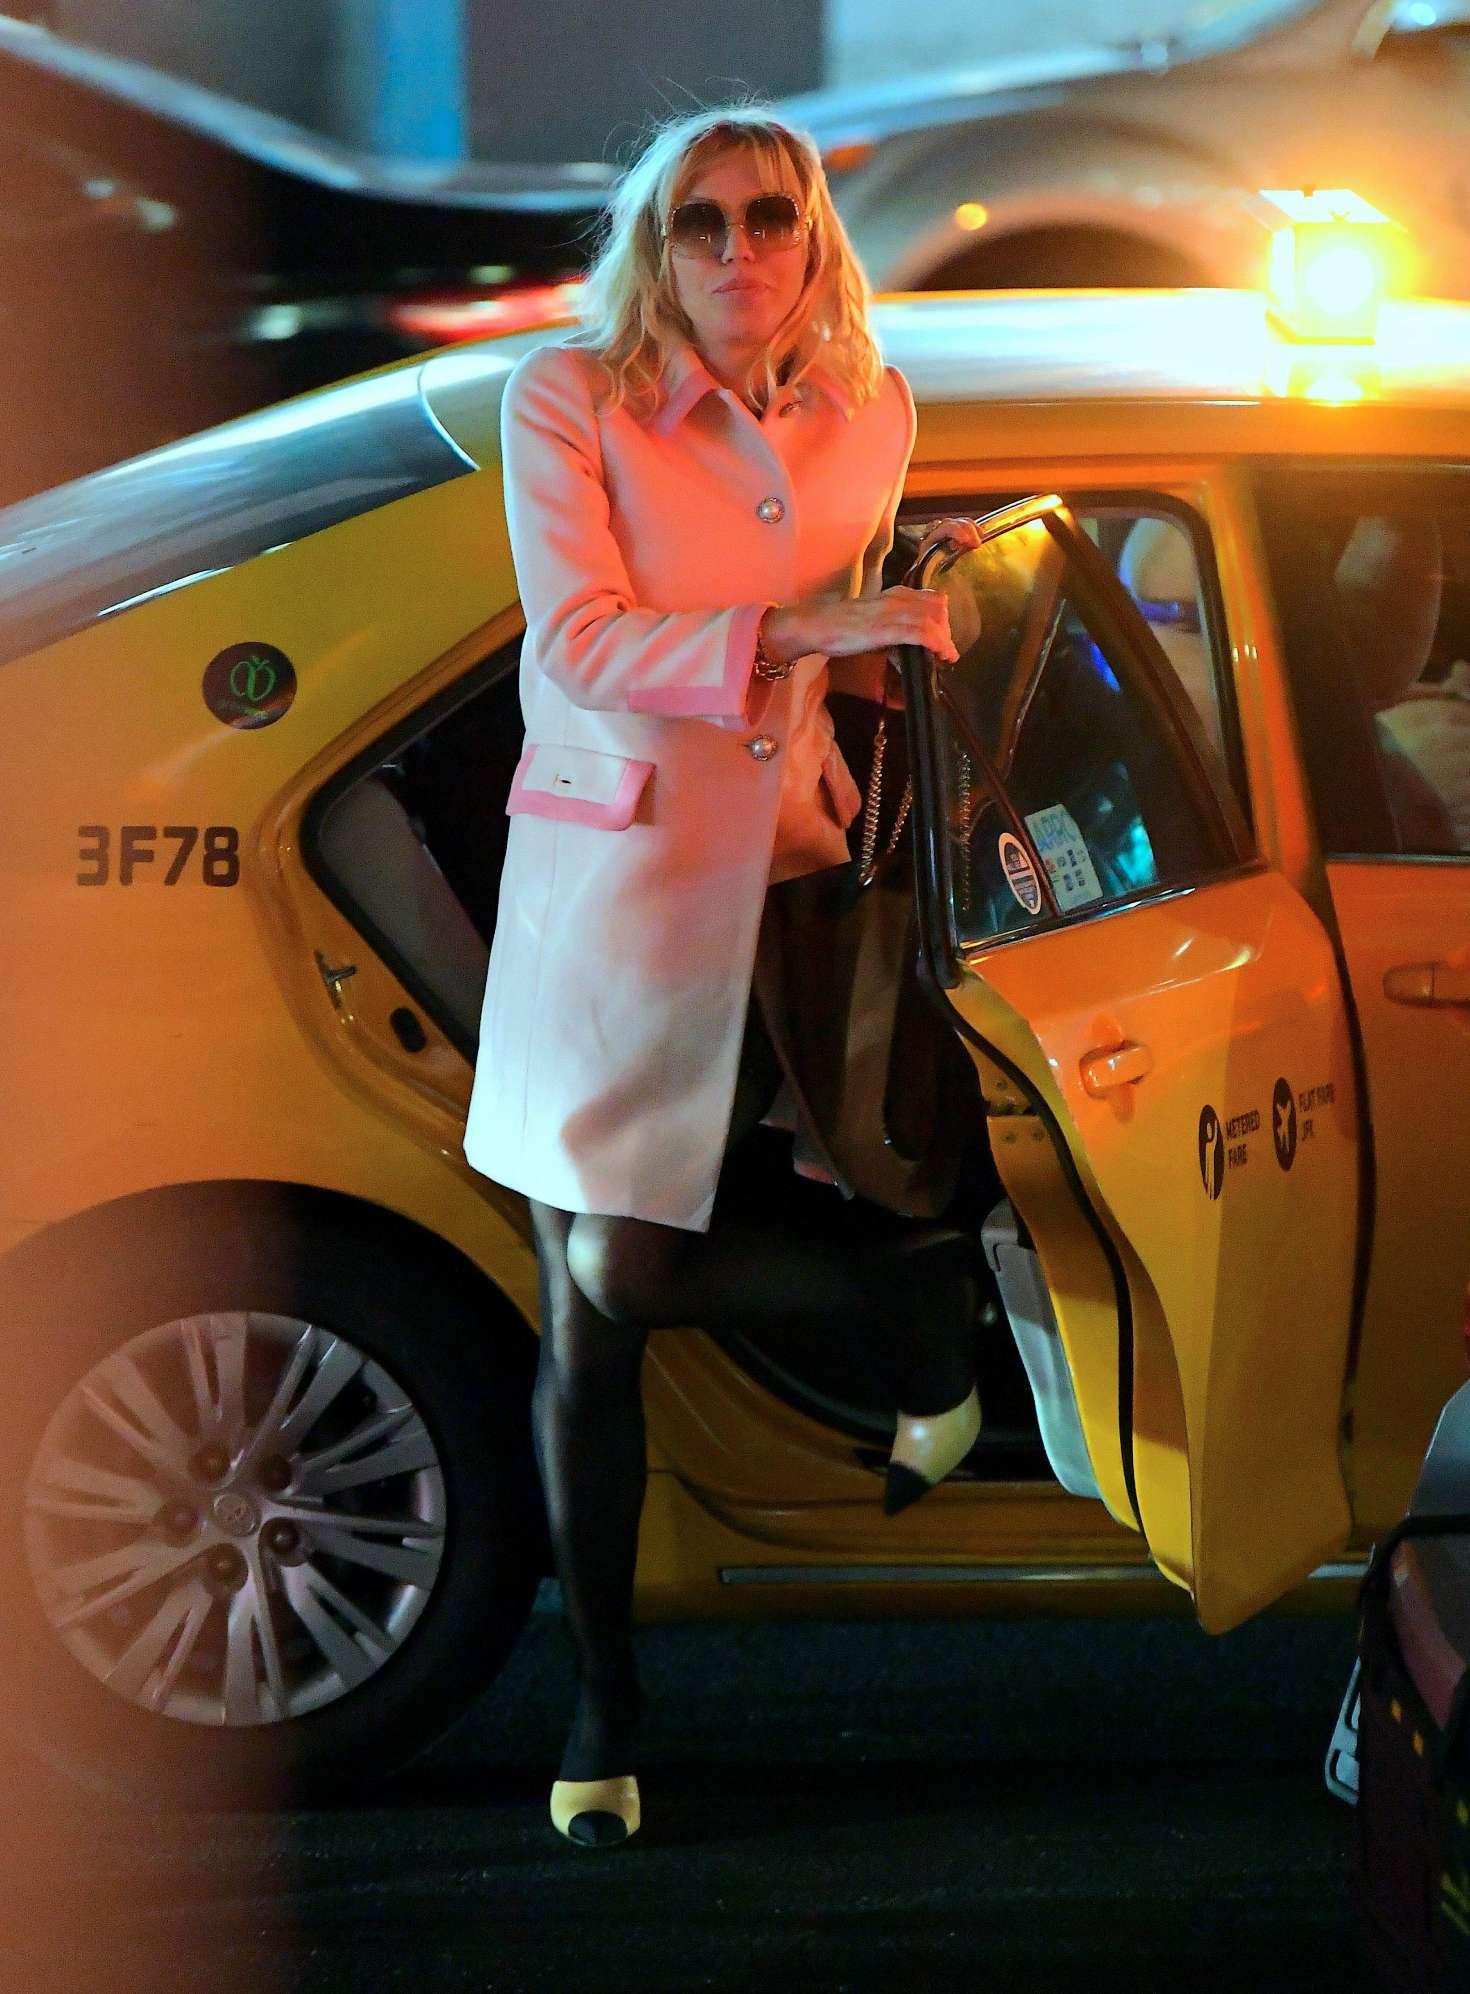 Courtney Love 2018 : Courtney Love: Arrives at the Mercer Kitchen -09